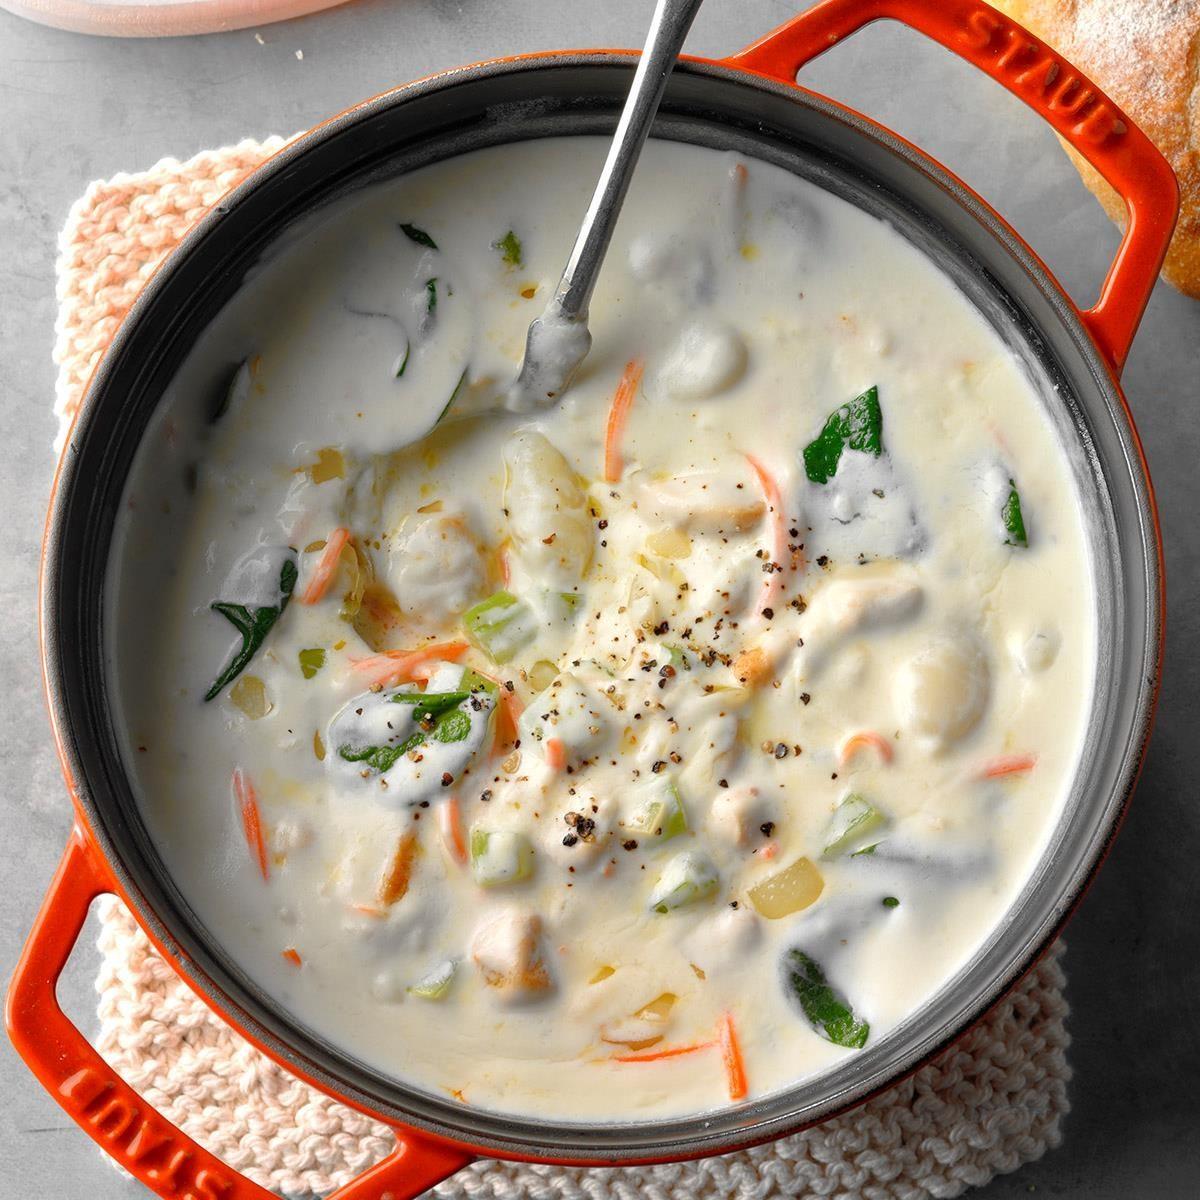 Sunday: Creamy Chicken Gnocchi Soup